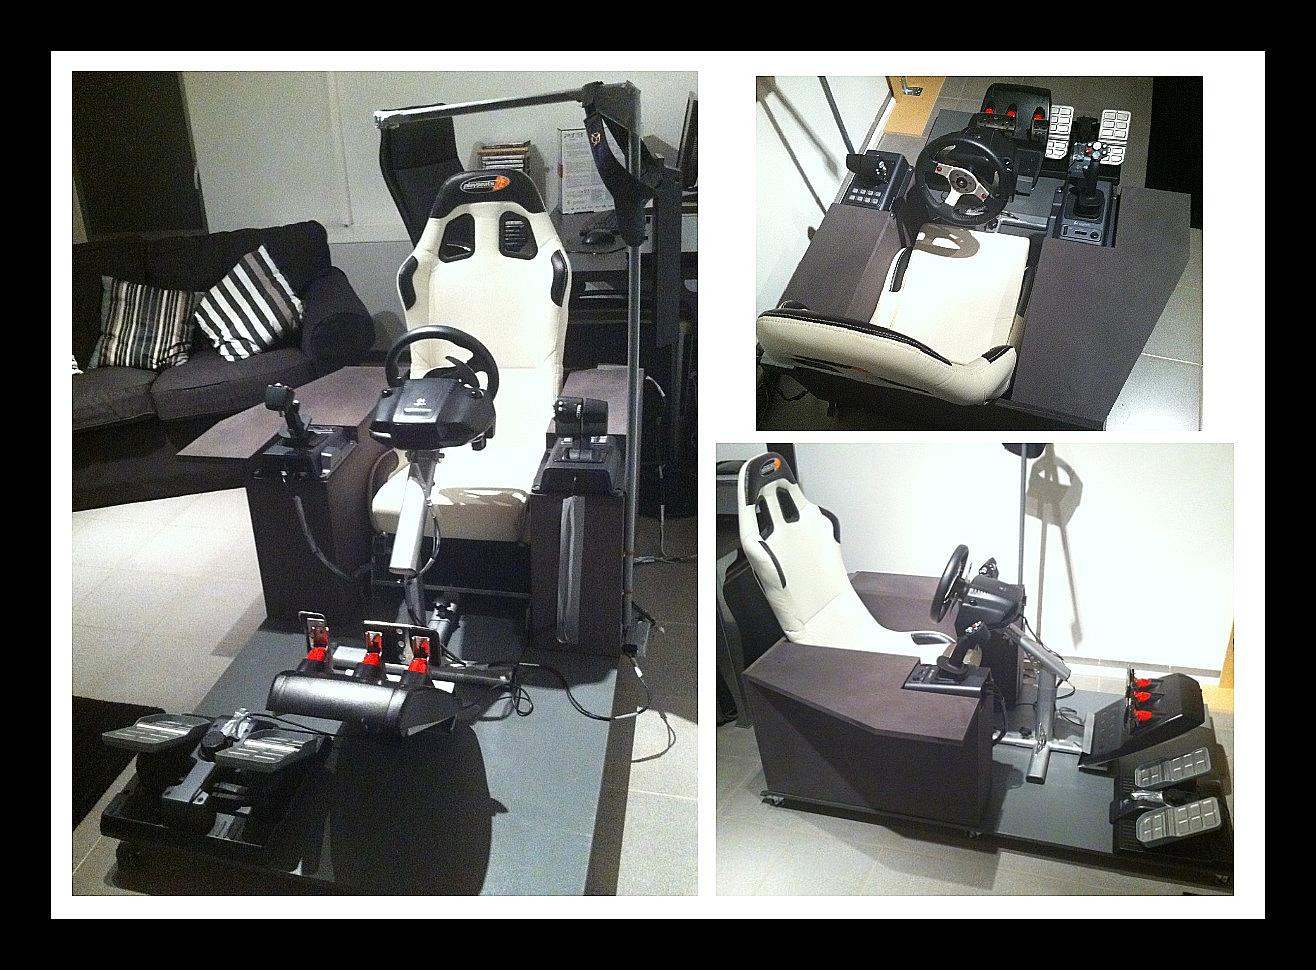 simulateur cockpit home made playseat g25 g940 track ir joys hardware. Black Bedroom Furniture Sets. Home Design Ideas